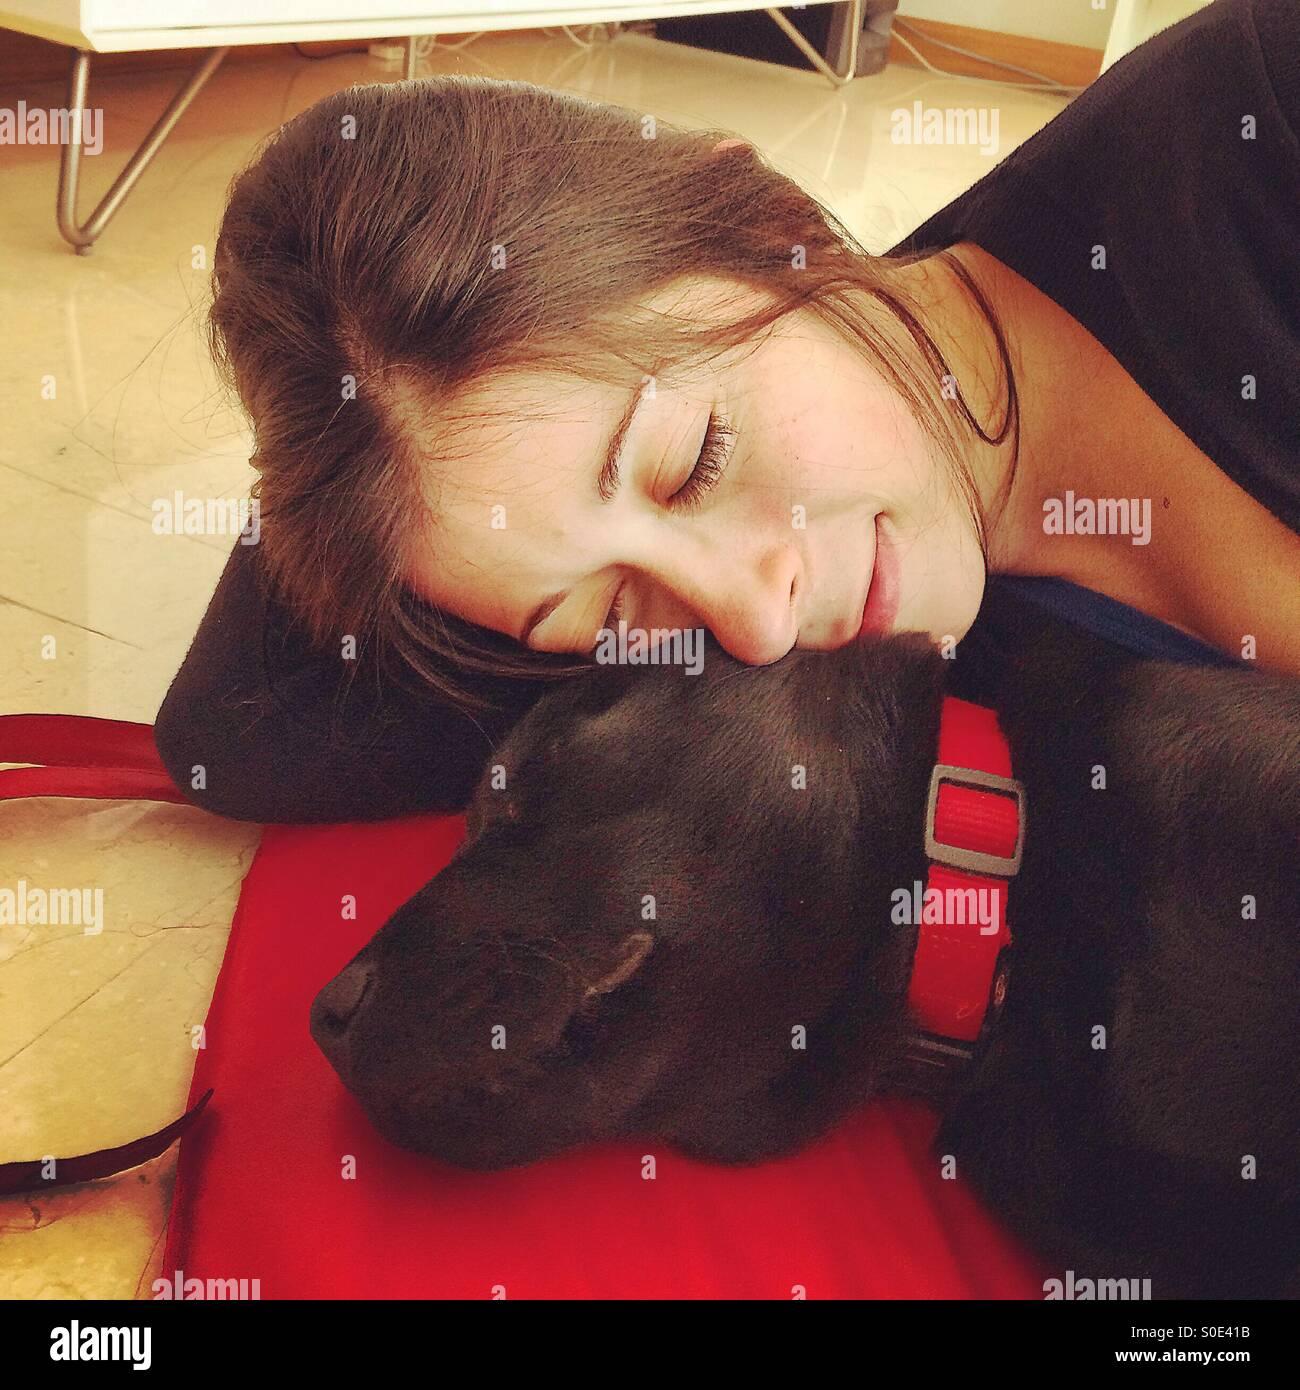 Young woman sleeping next to black Labrador Retriever puppy - Stock Image